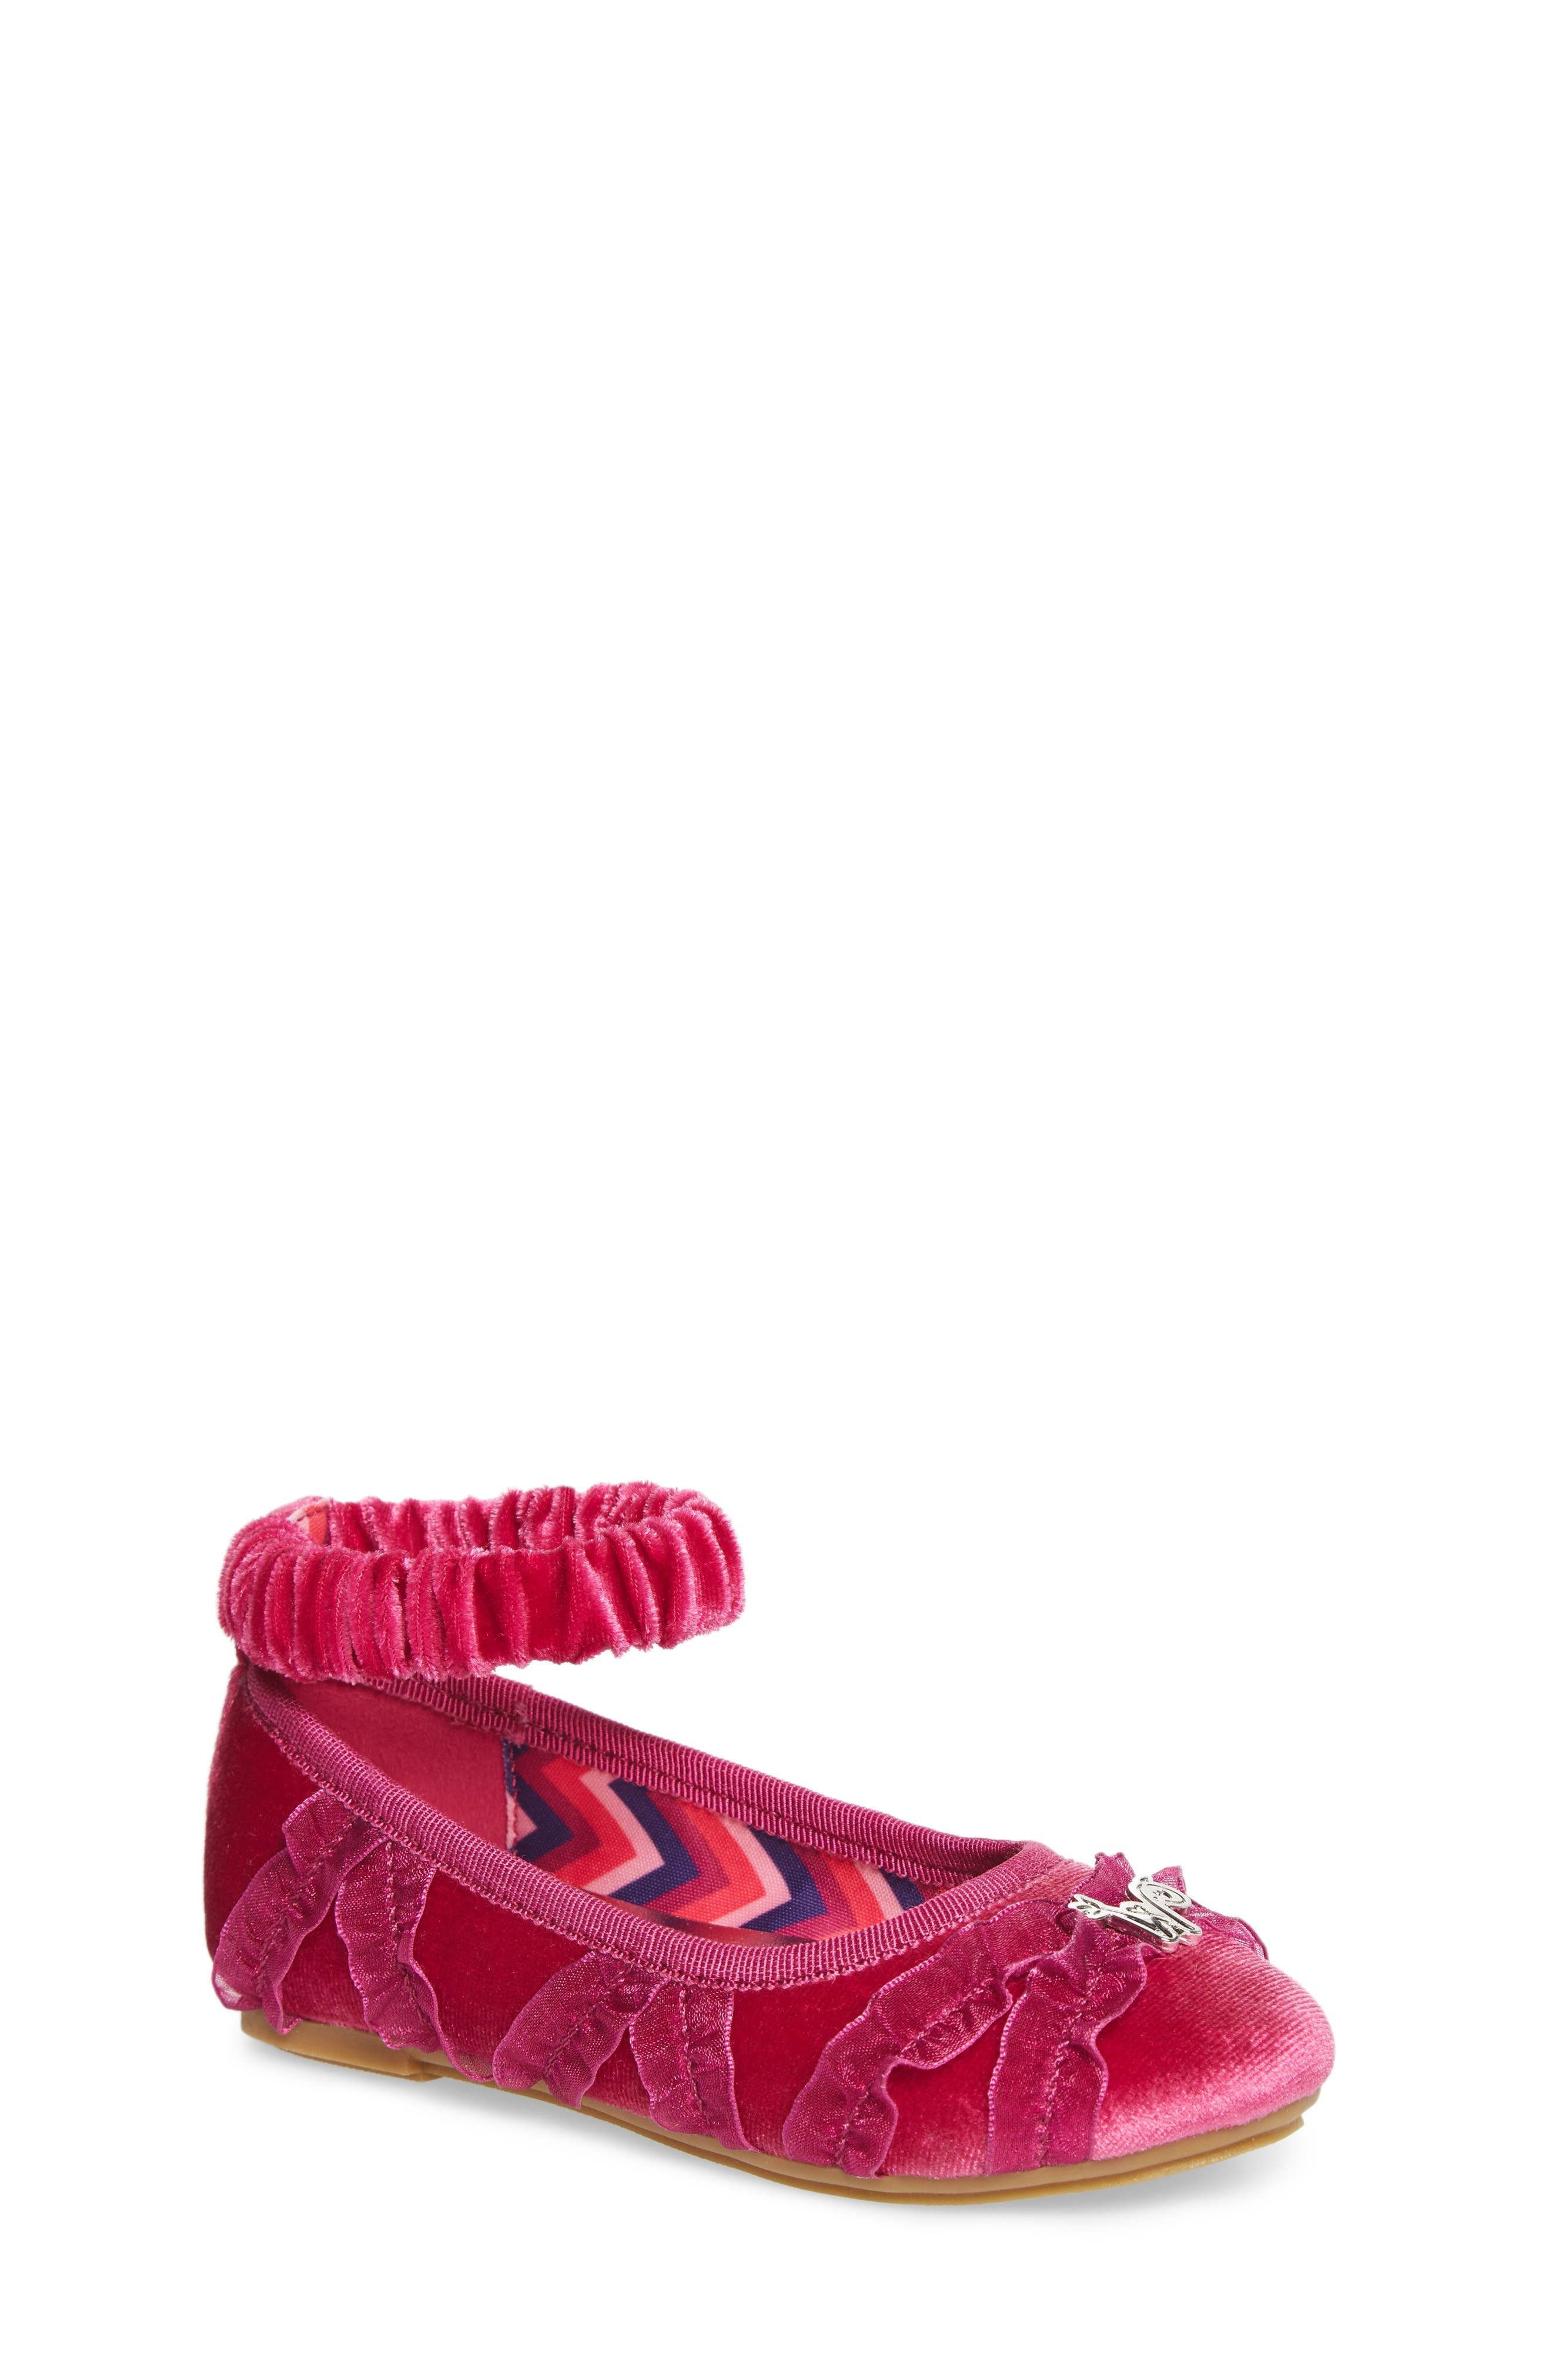 Emerson Ankle Strap Ballet Flat,                         Main,                         color, 650